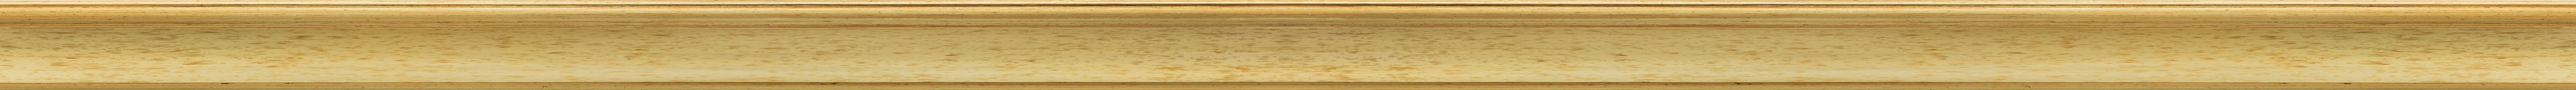 Classic gold frame frame